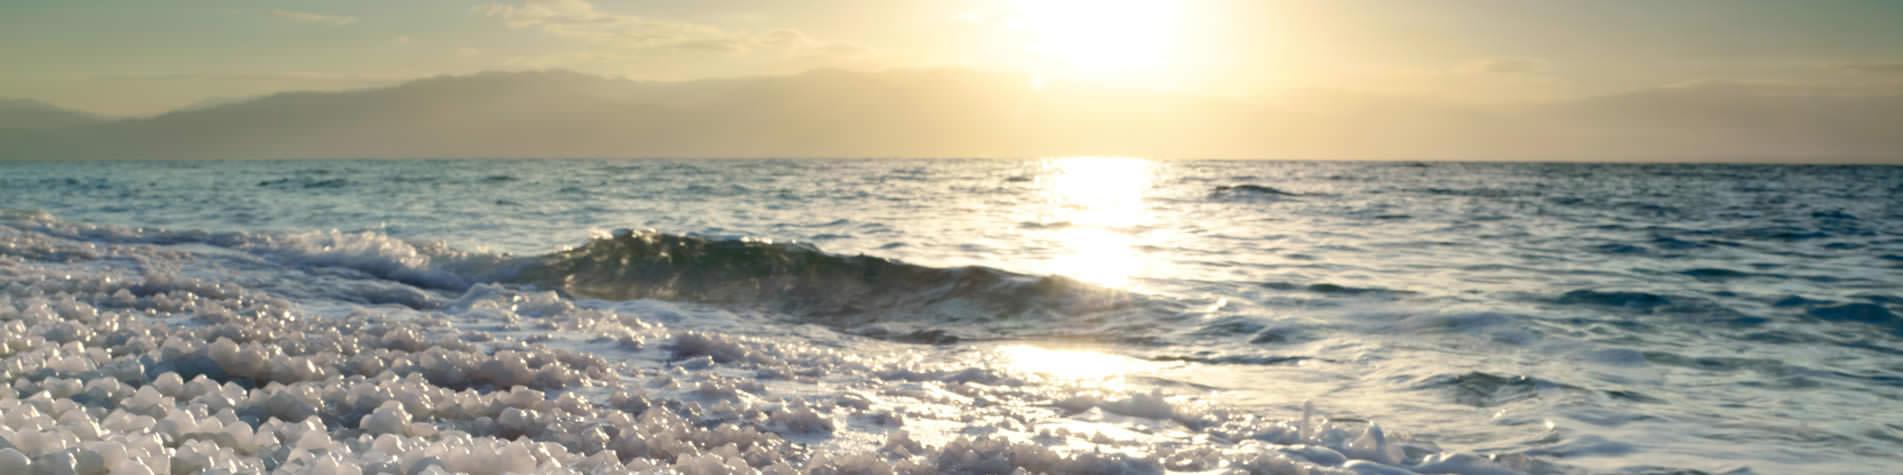 Stunning Dead Sea Holidays